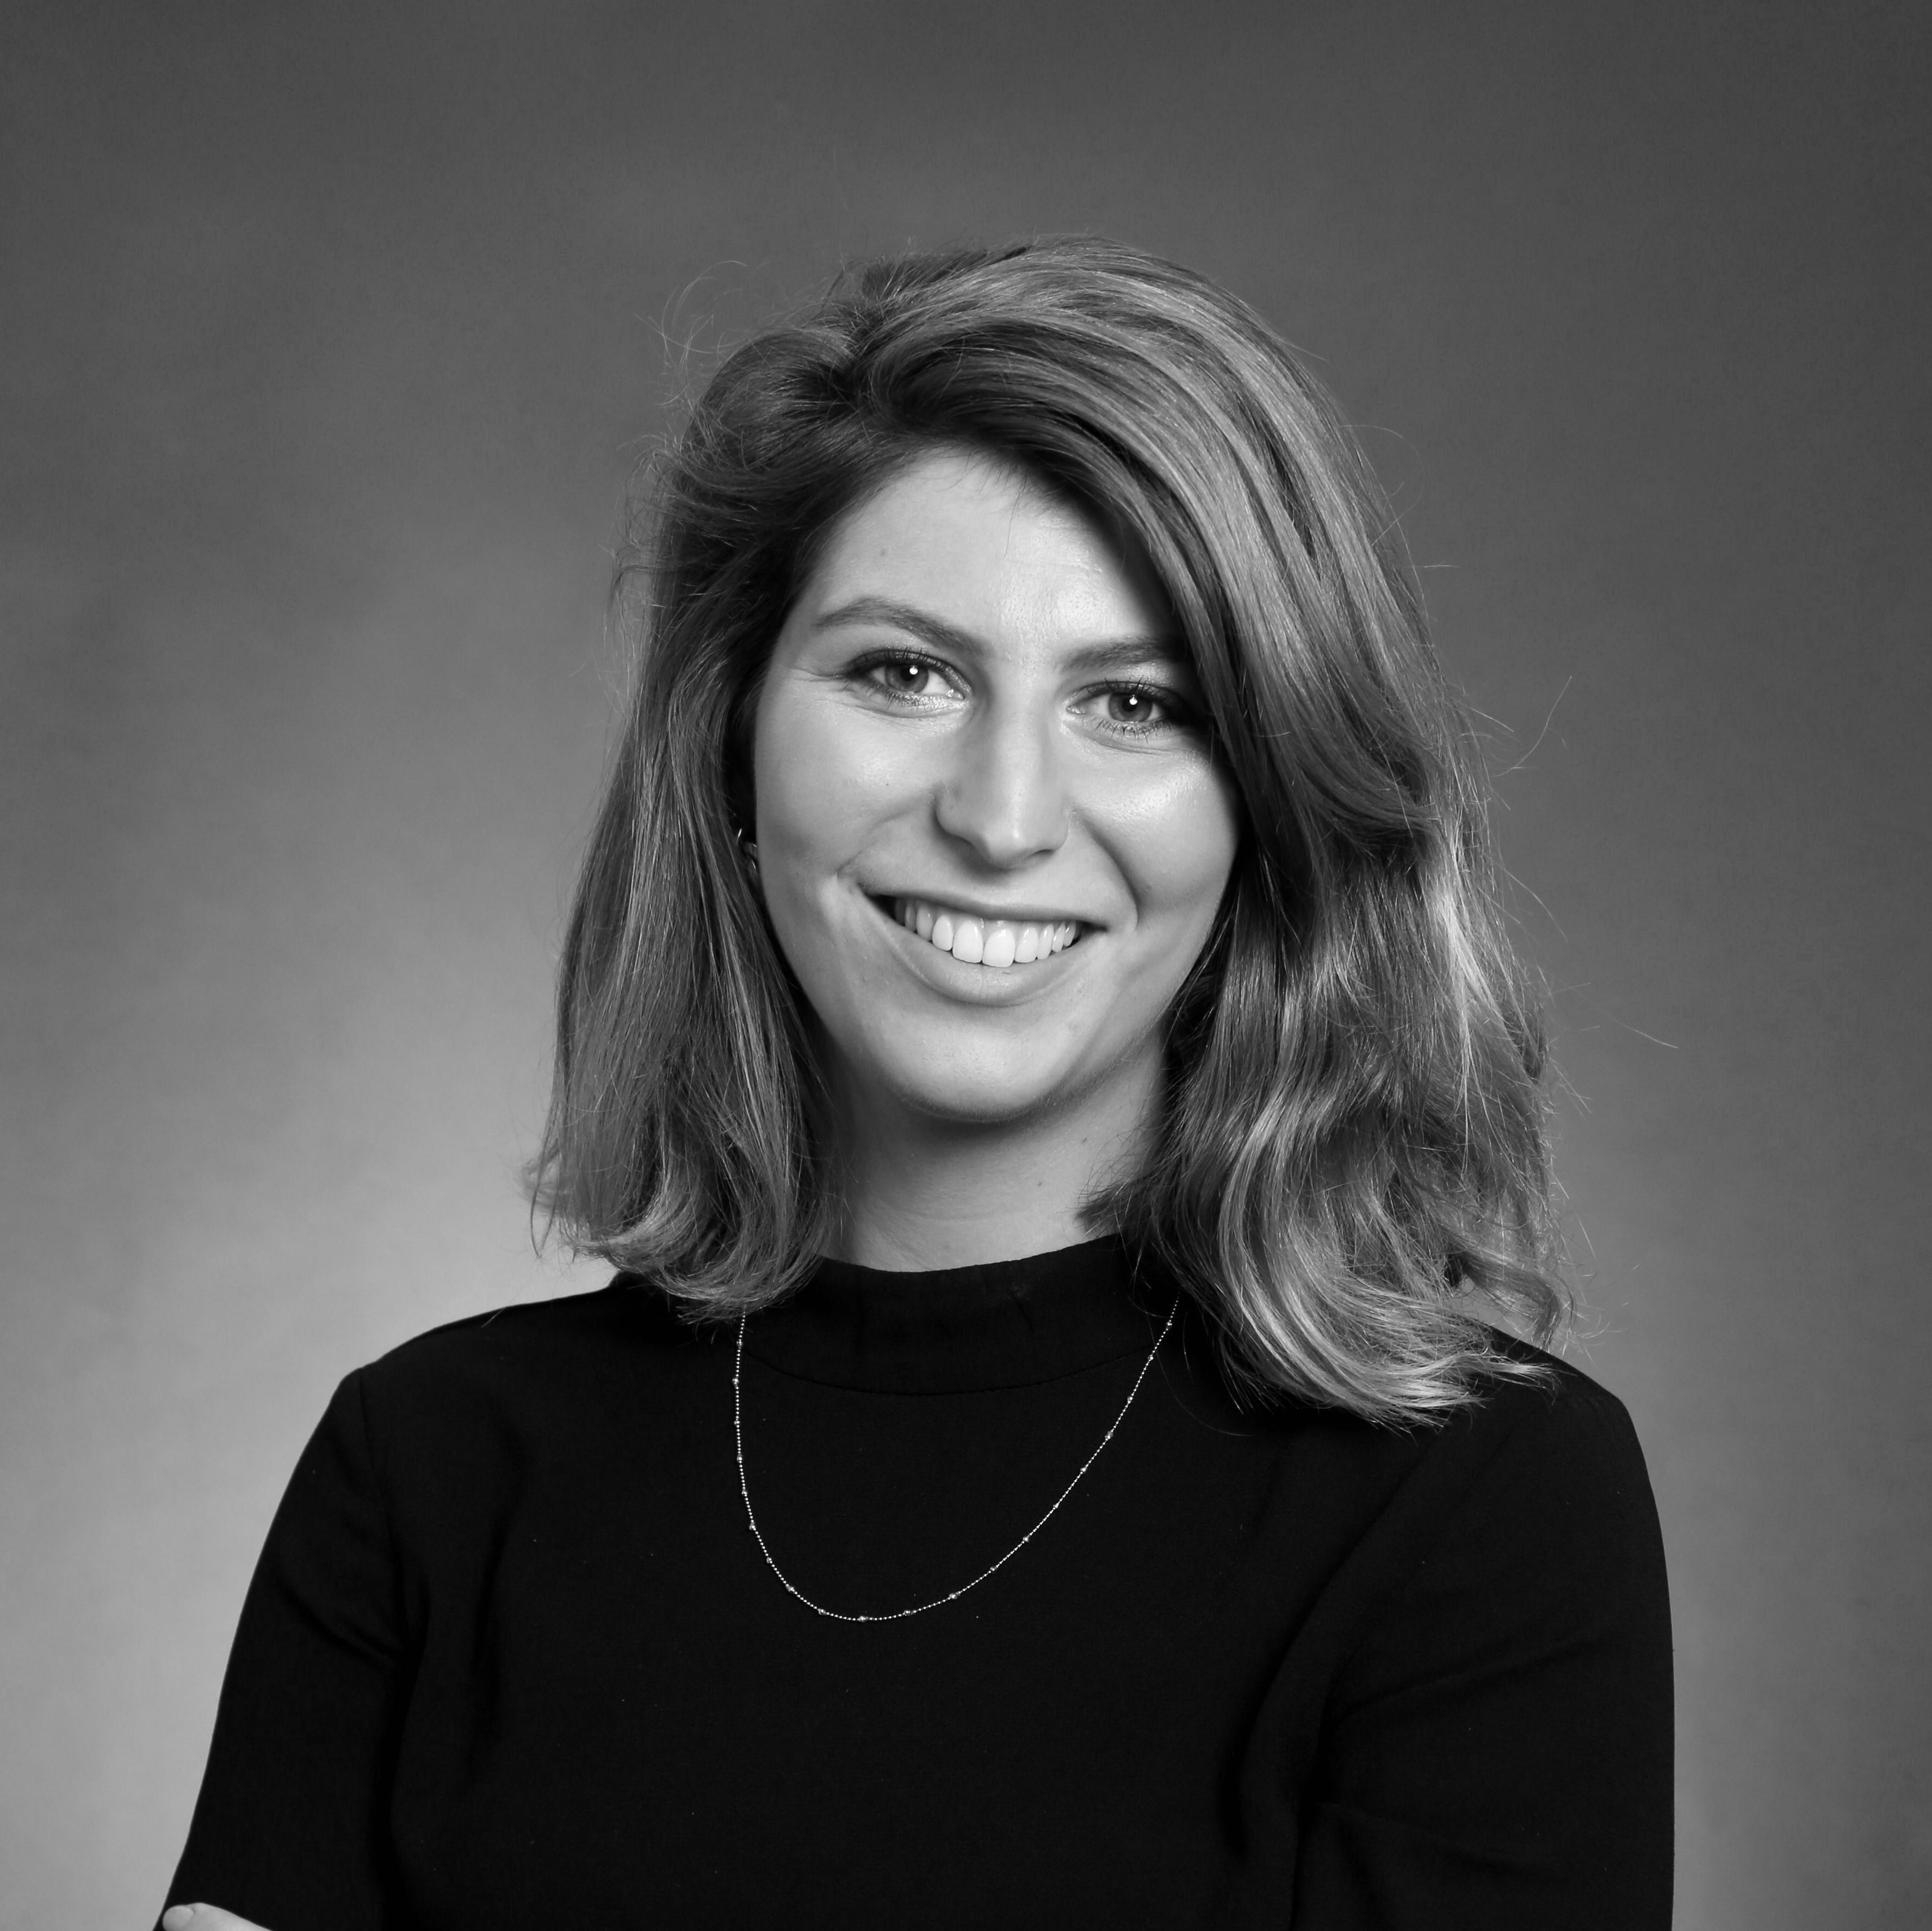 Portrait of Niki Kunst (Junior Consultant, sinds 2019 bij Roland Berger)